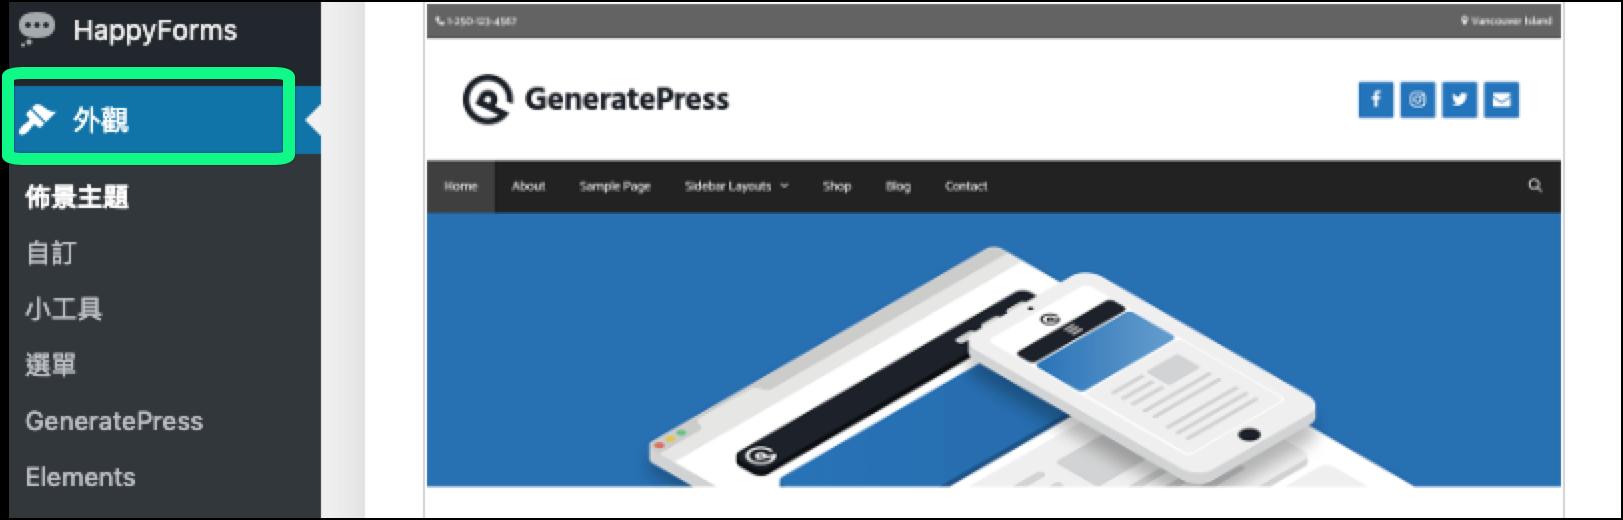 wphack11 - 如何保護你的 WordPress 網站?掌握這 9 個小技巧遠離駭客入侵